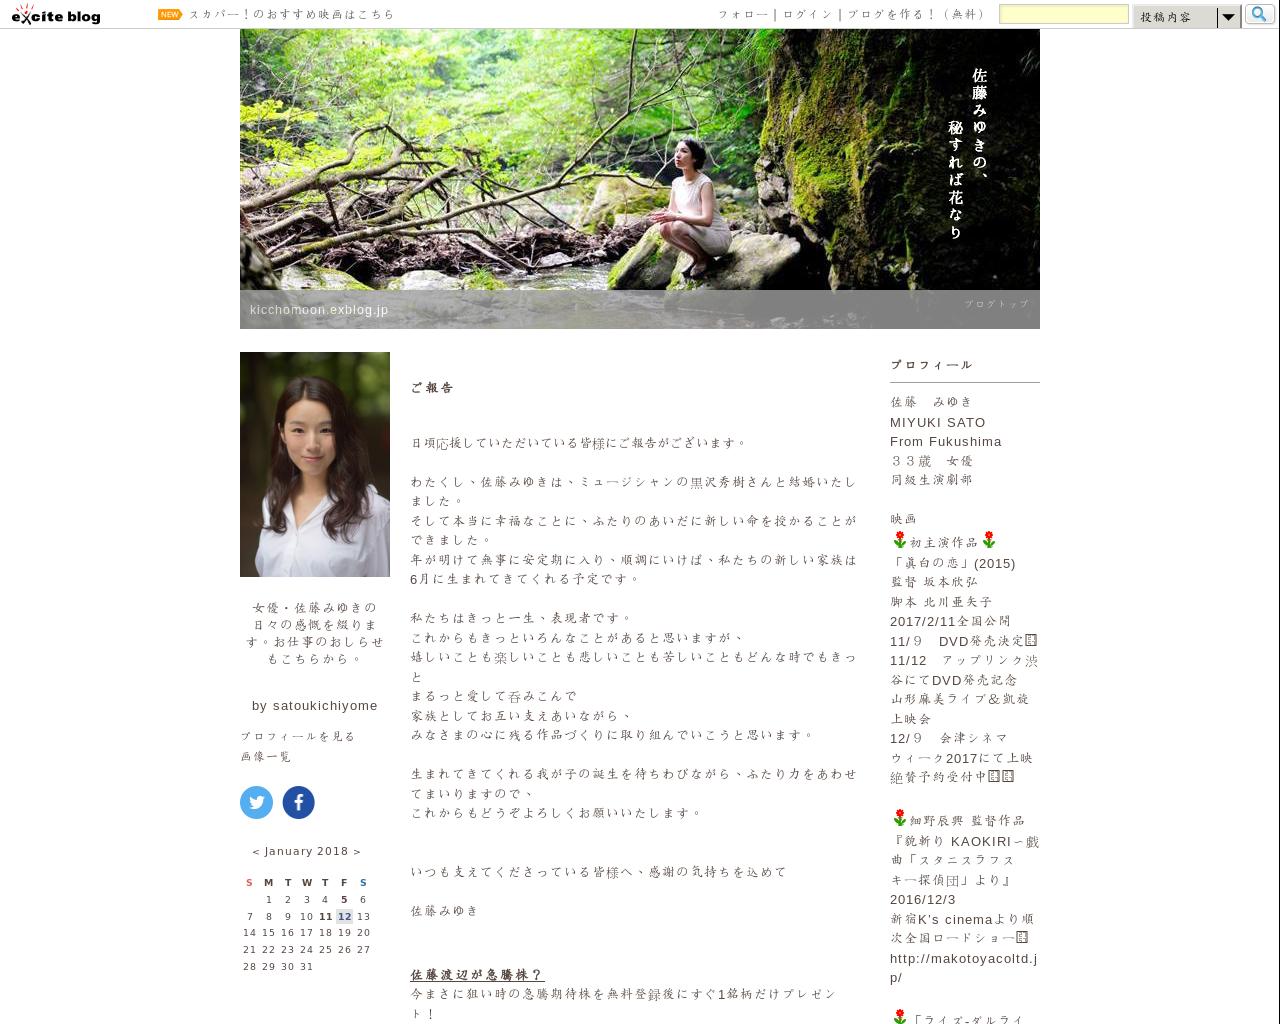 kicchomoon.exblog.jp(2018/01/12 13:10:40)